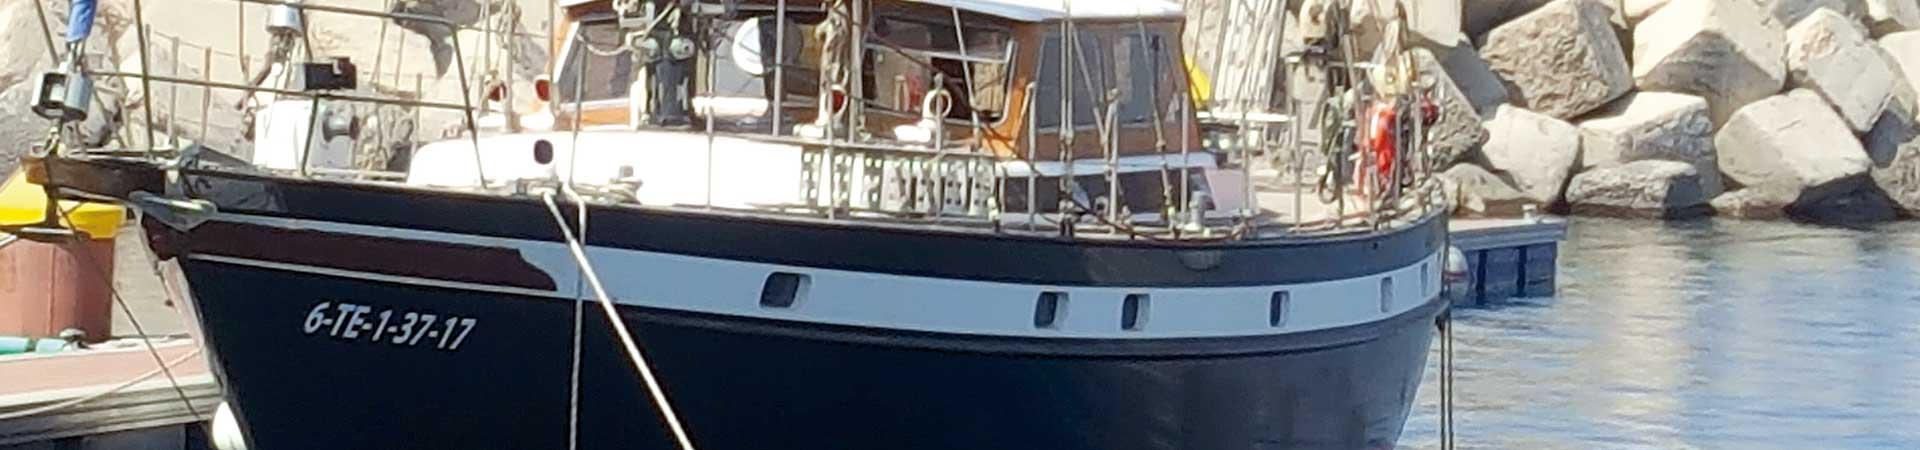 https://www.goodmorningtenerife.com/wp-content/uploads/2018/01/03_slide_albatros-charter-excursions-tenerife-1920x450-good-morning-tenerife.jpg